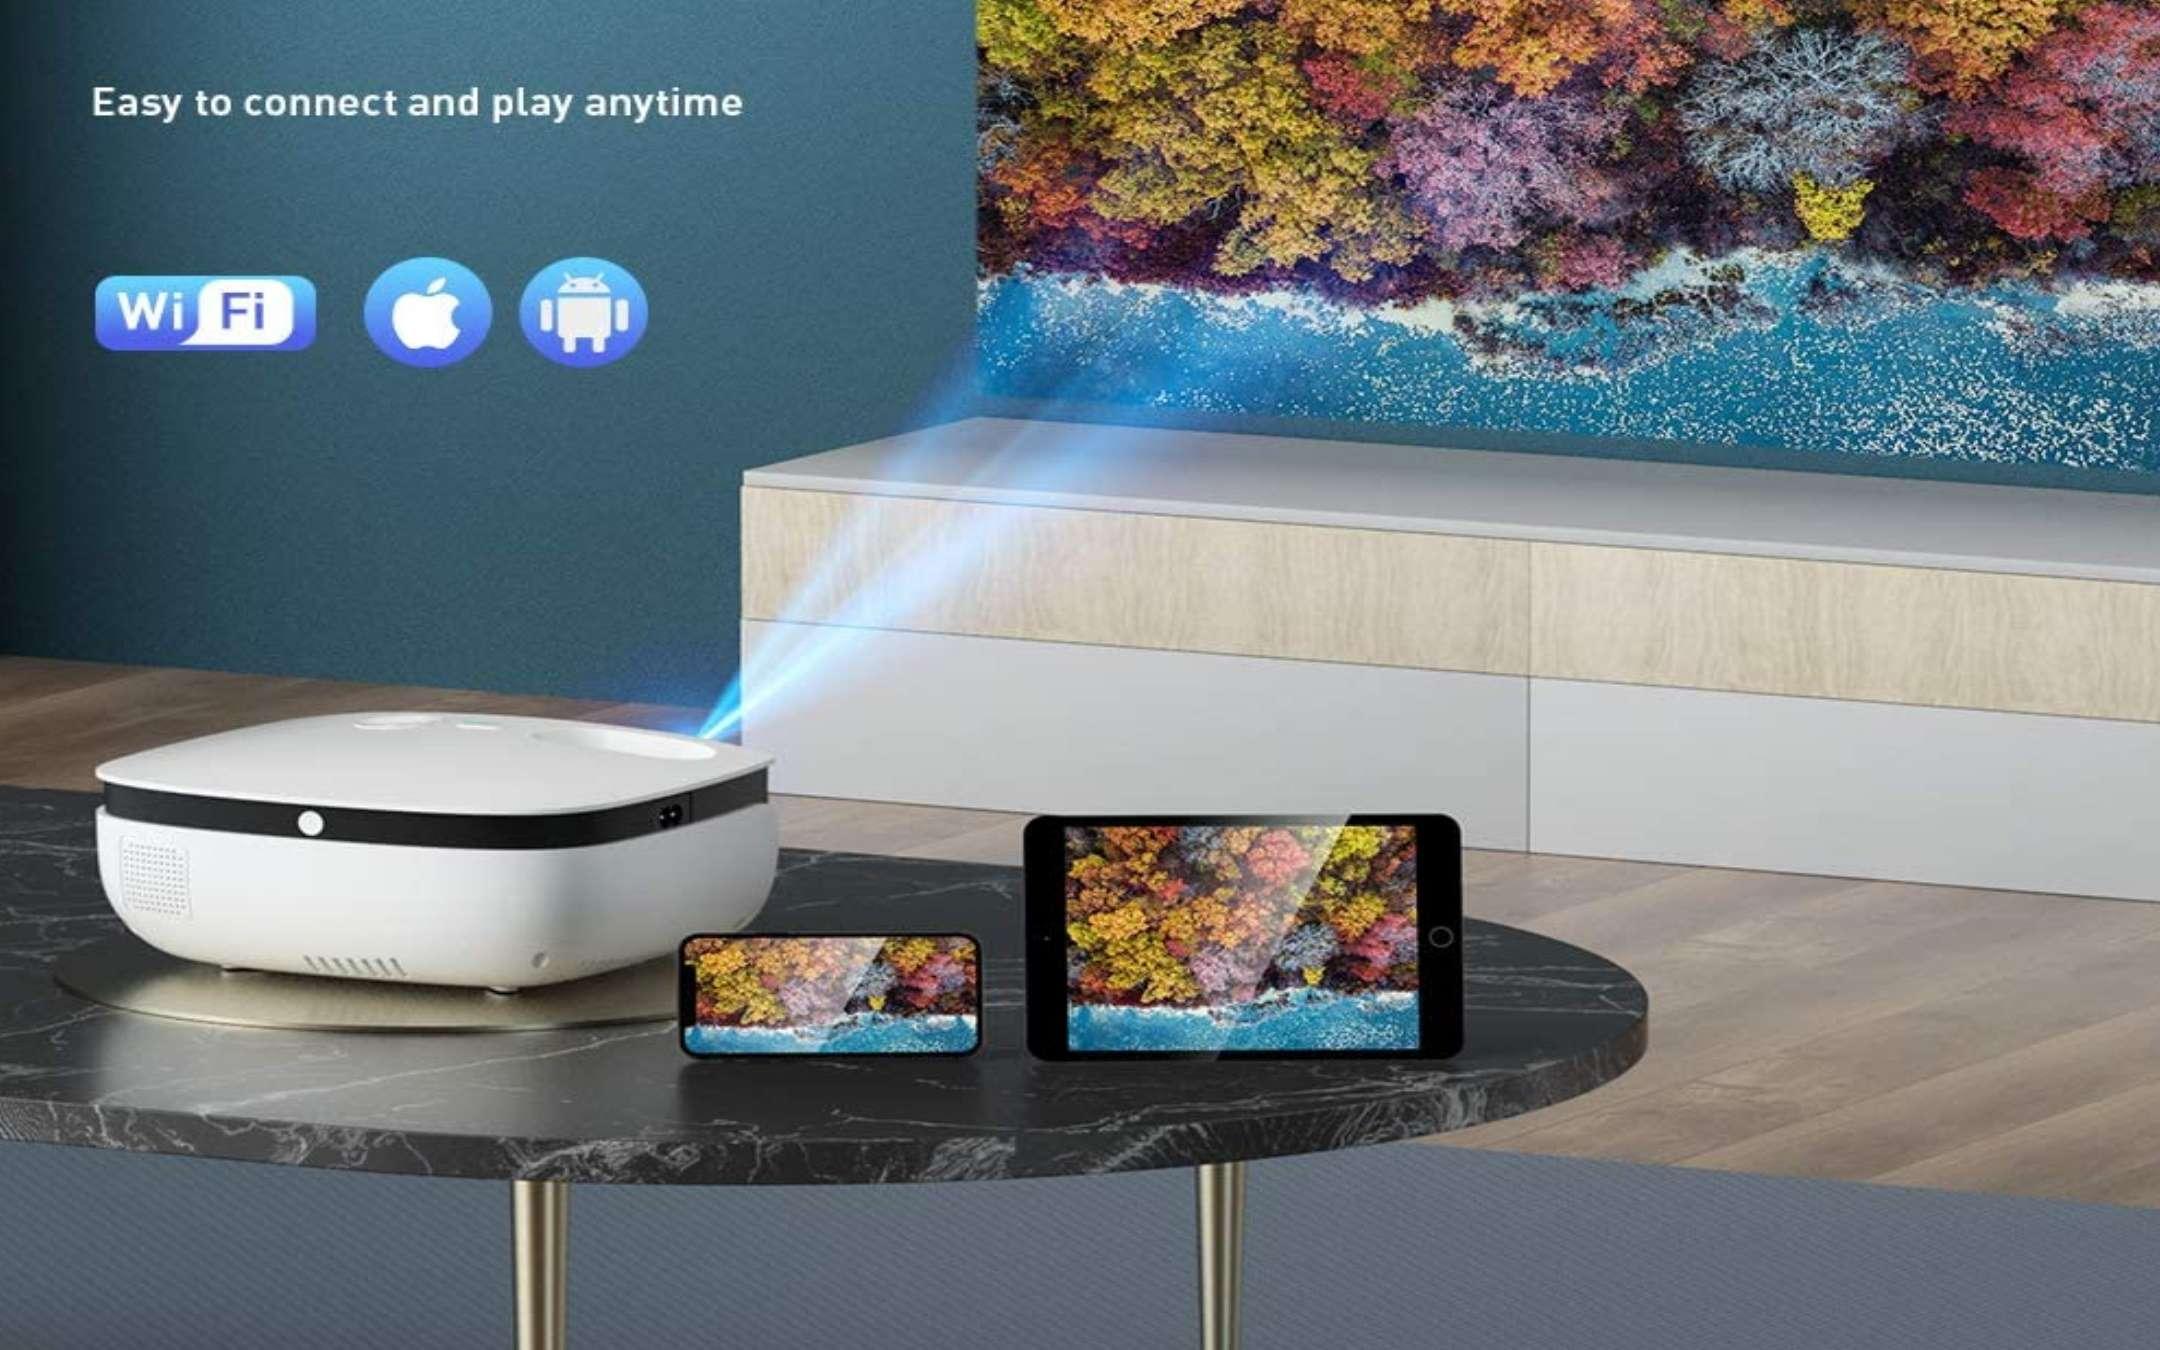 Proiettore WiMius S25 720p Wi-Fi e Bluetooth - 2